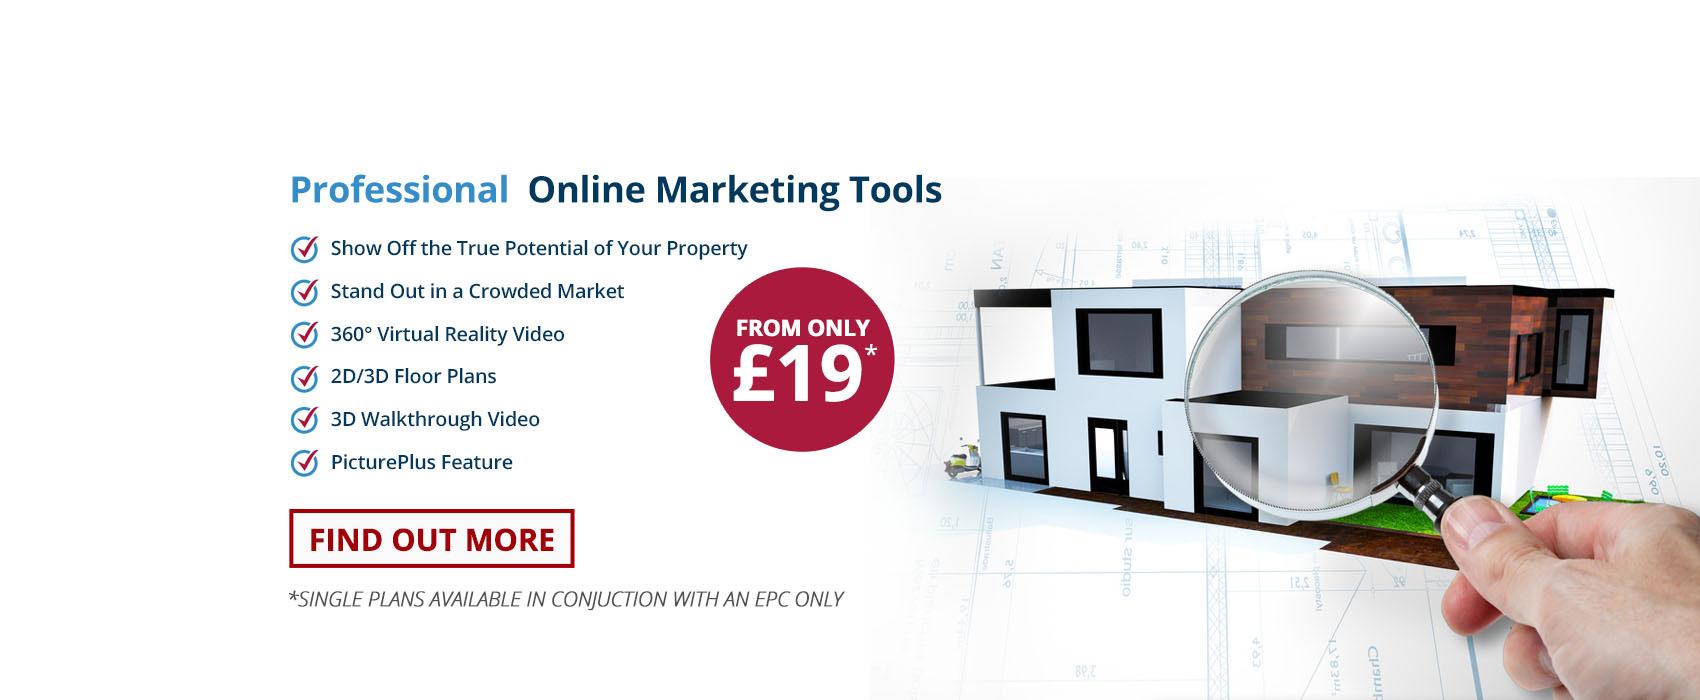 Professional Online Marketing Tools